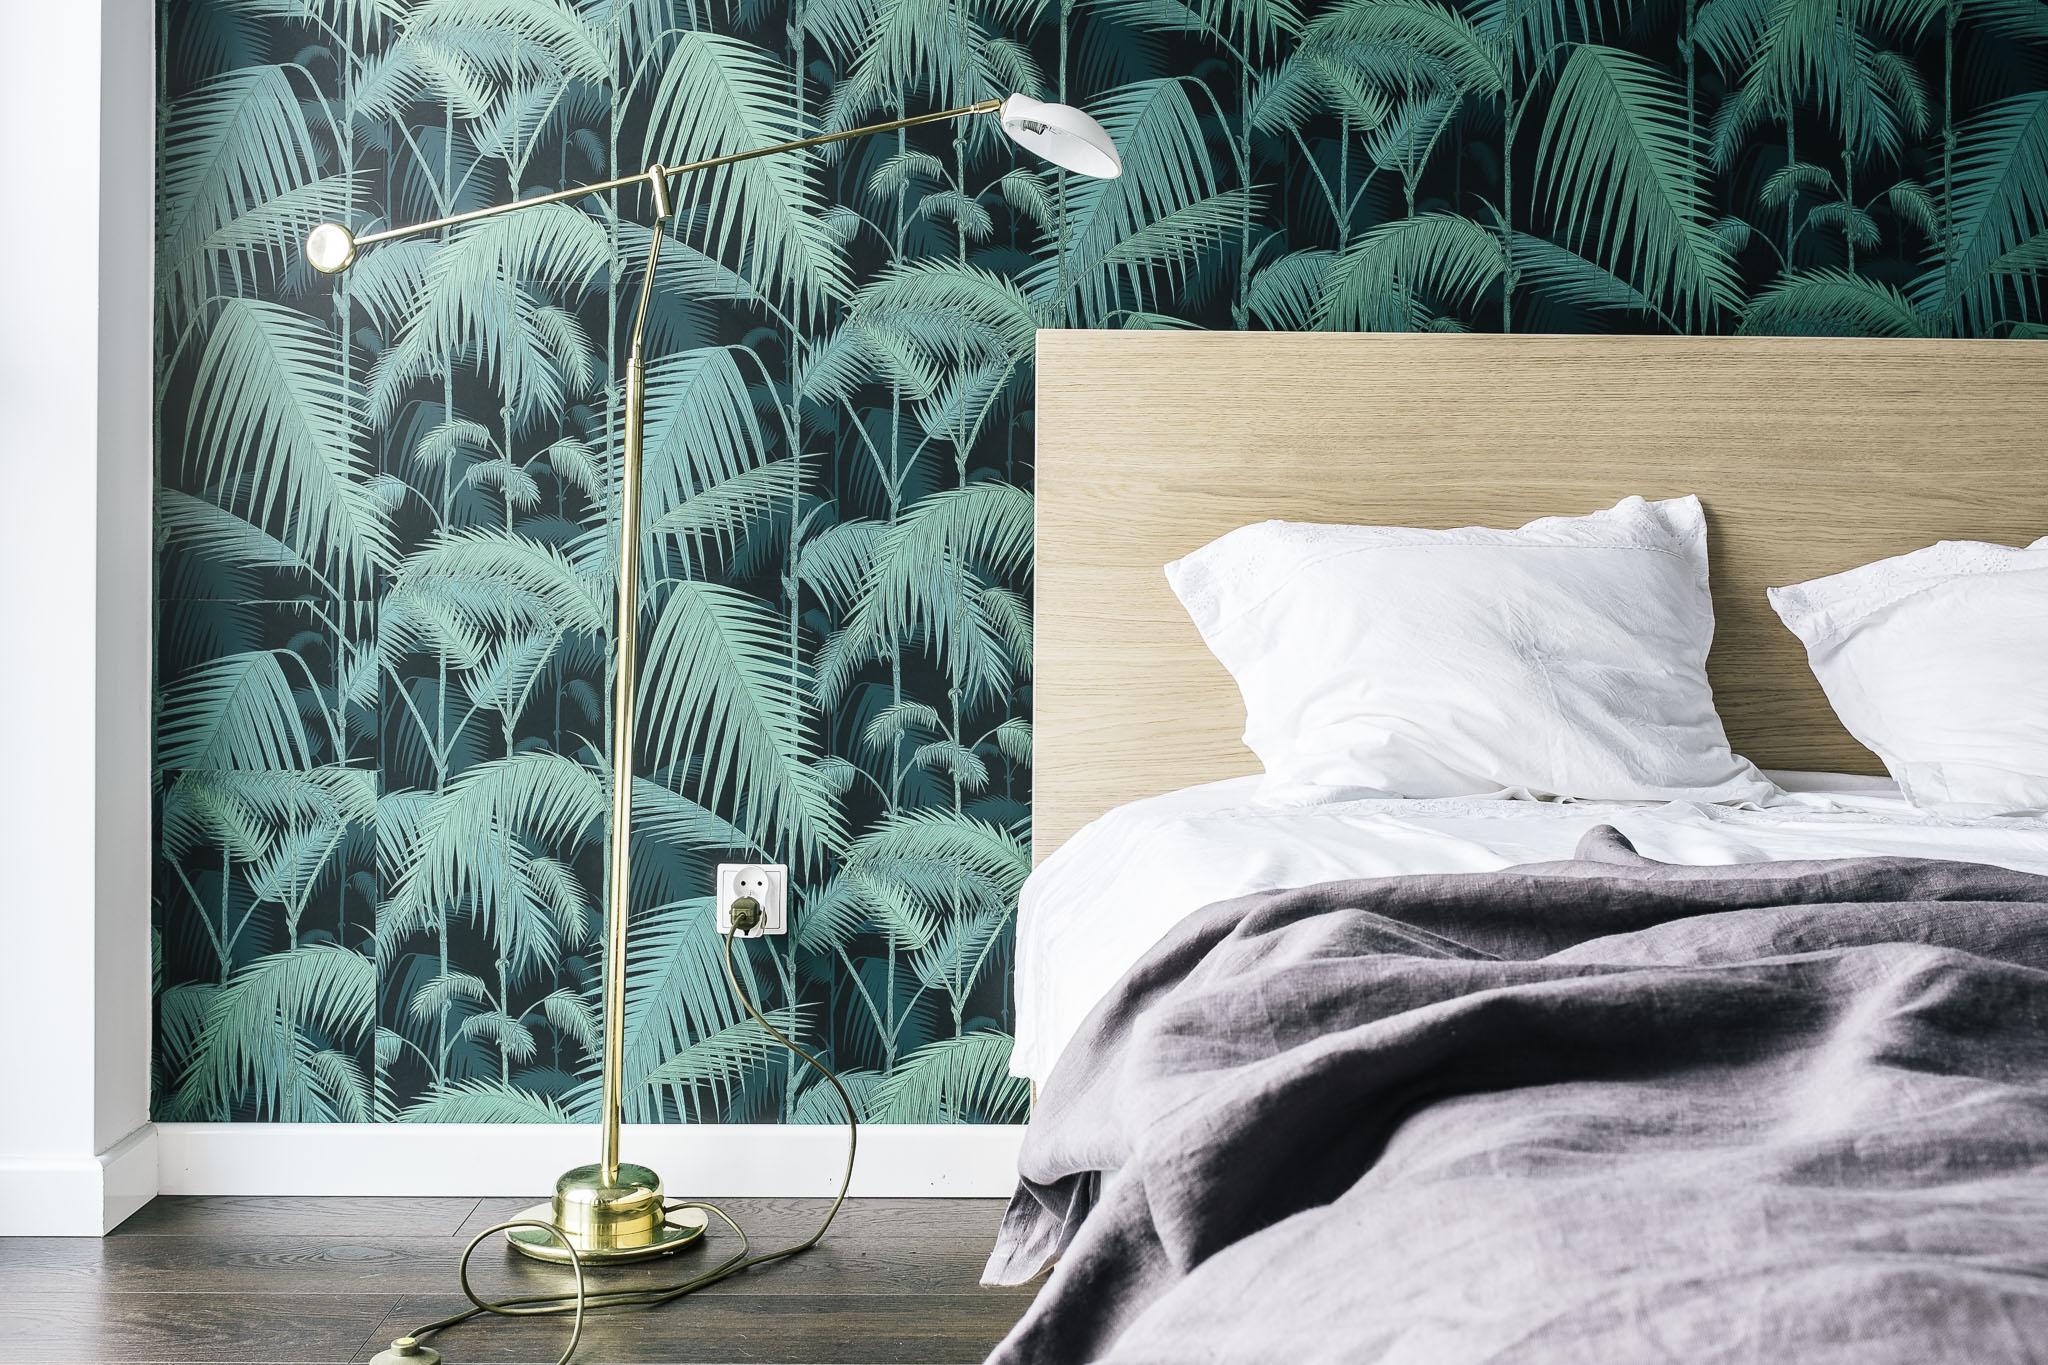 Retro Slaapkamer Meubels : Vintage retro slaapkamer met behang van cole & son interieur